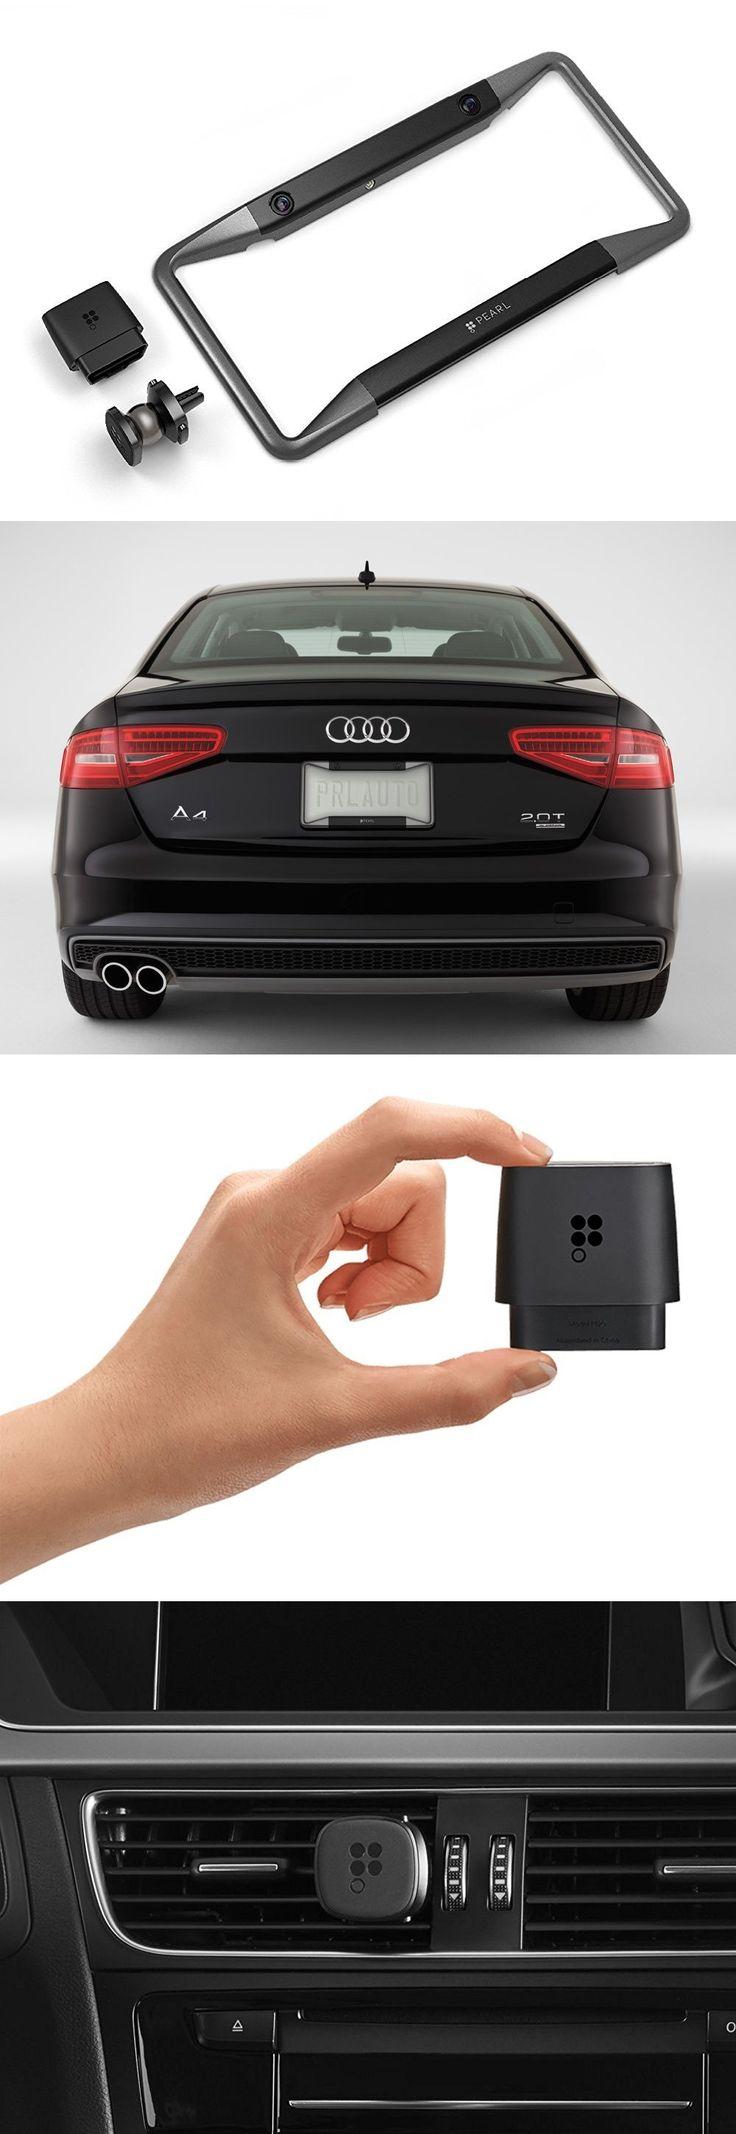 Wireless Car Backup Camera System   Craze Trend